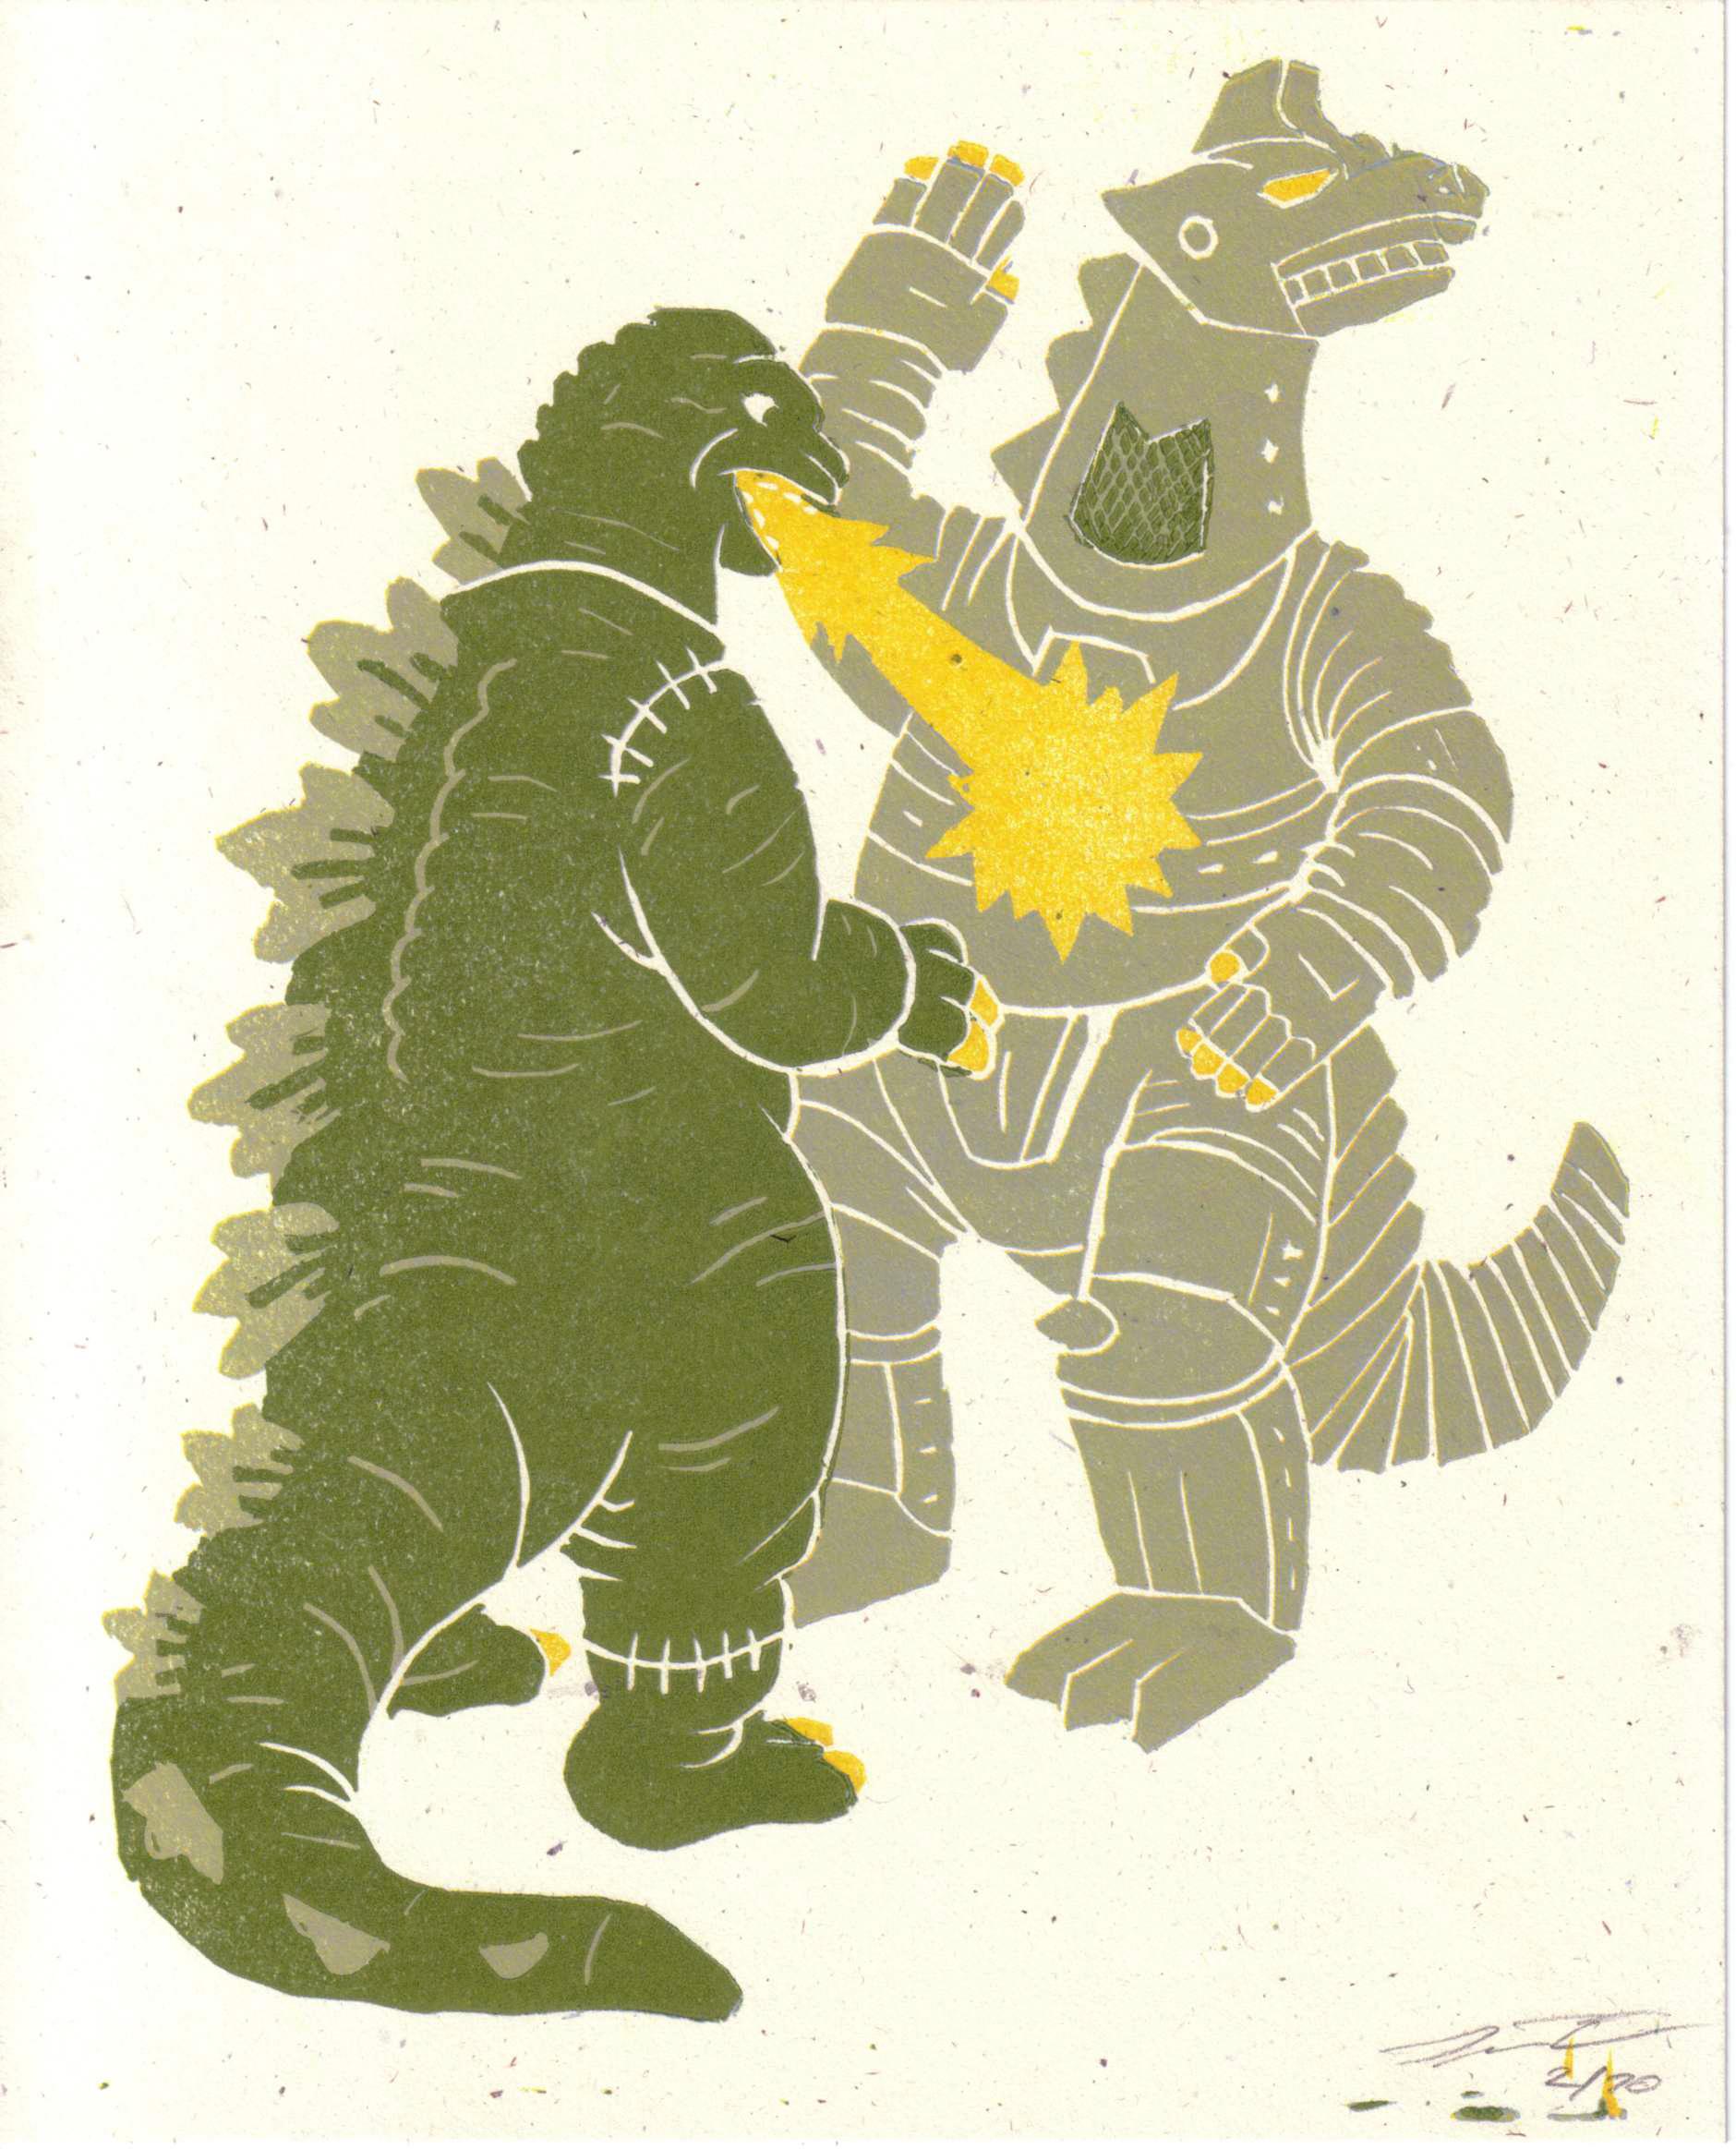 Godzillaprint